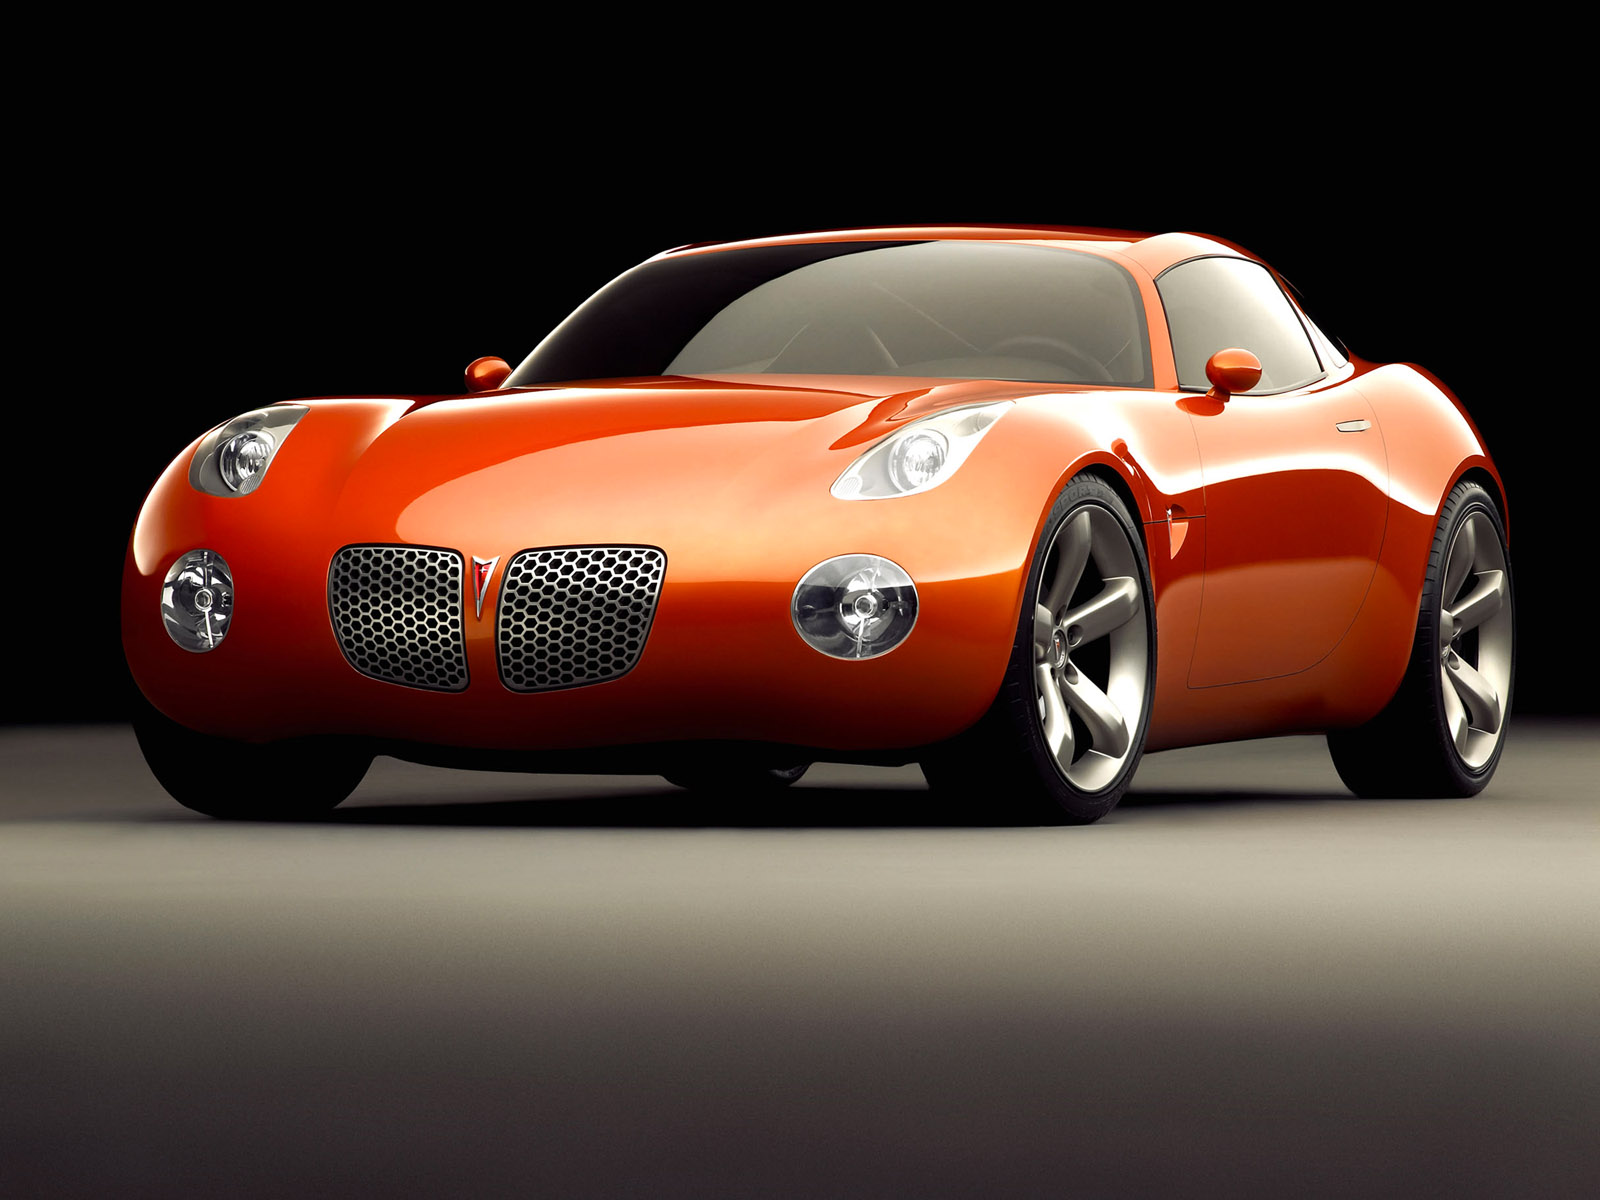 Pontiac-Solstice-Coupe-RA-1600x1200.jpg